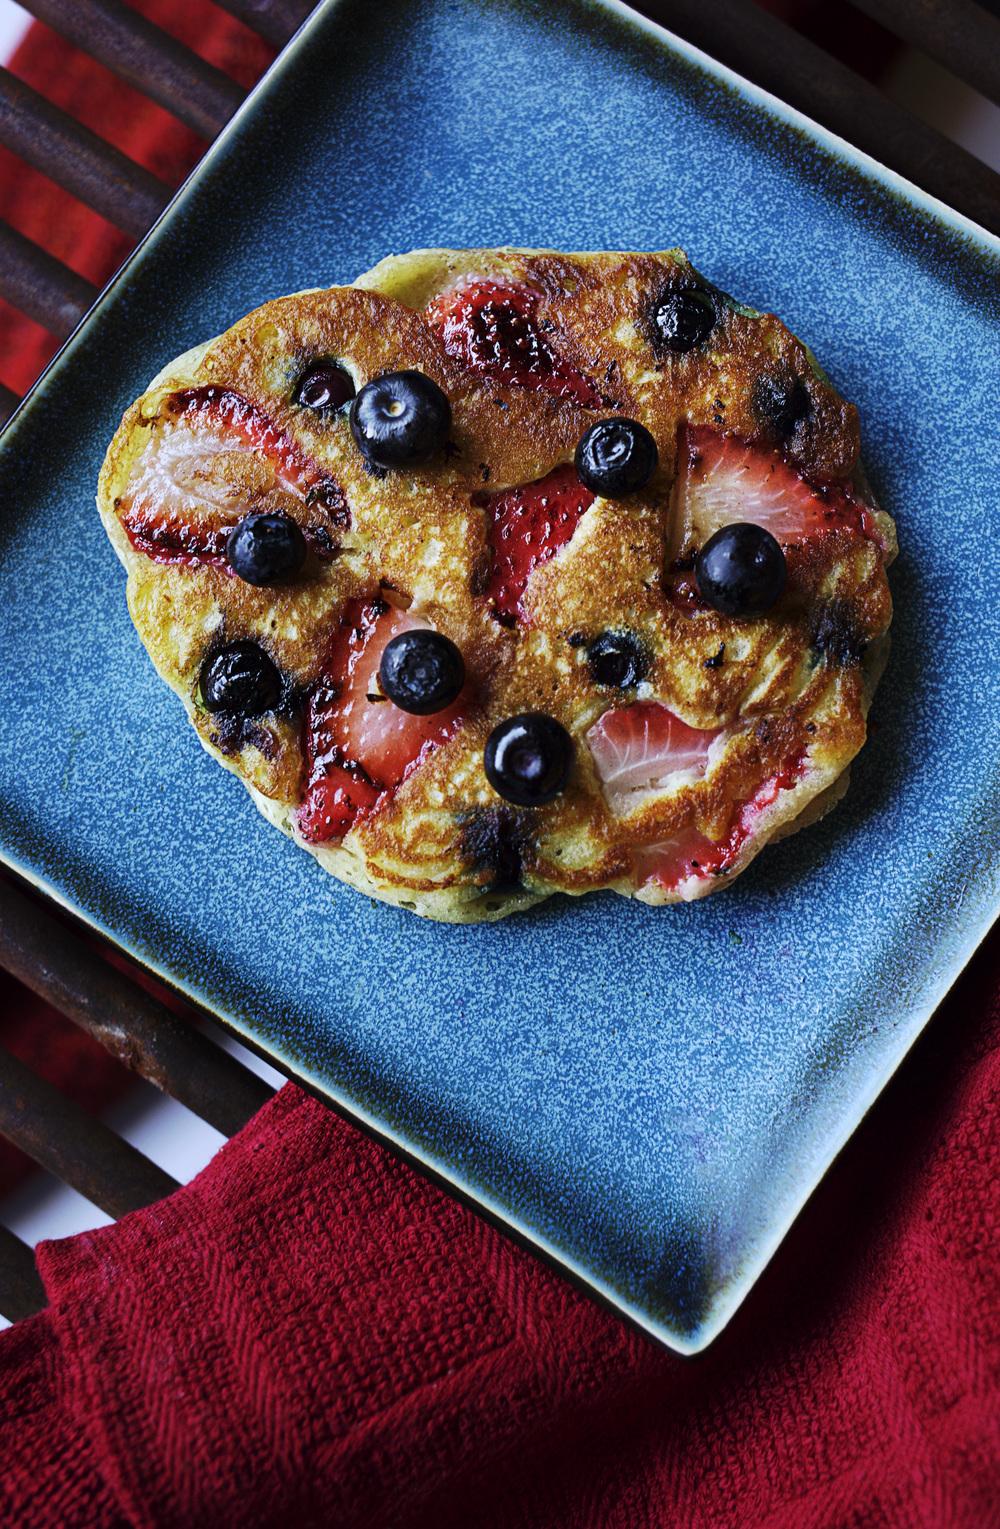 StrawberryBlueberryPancake01.jpg